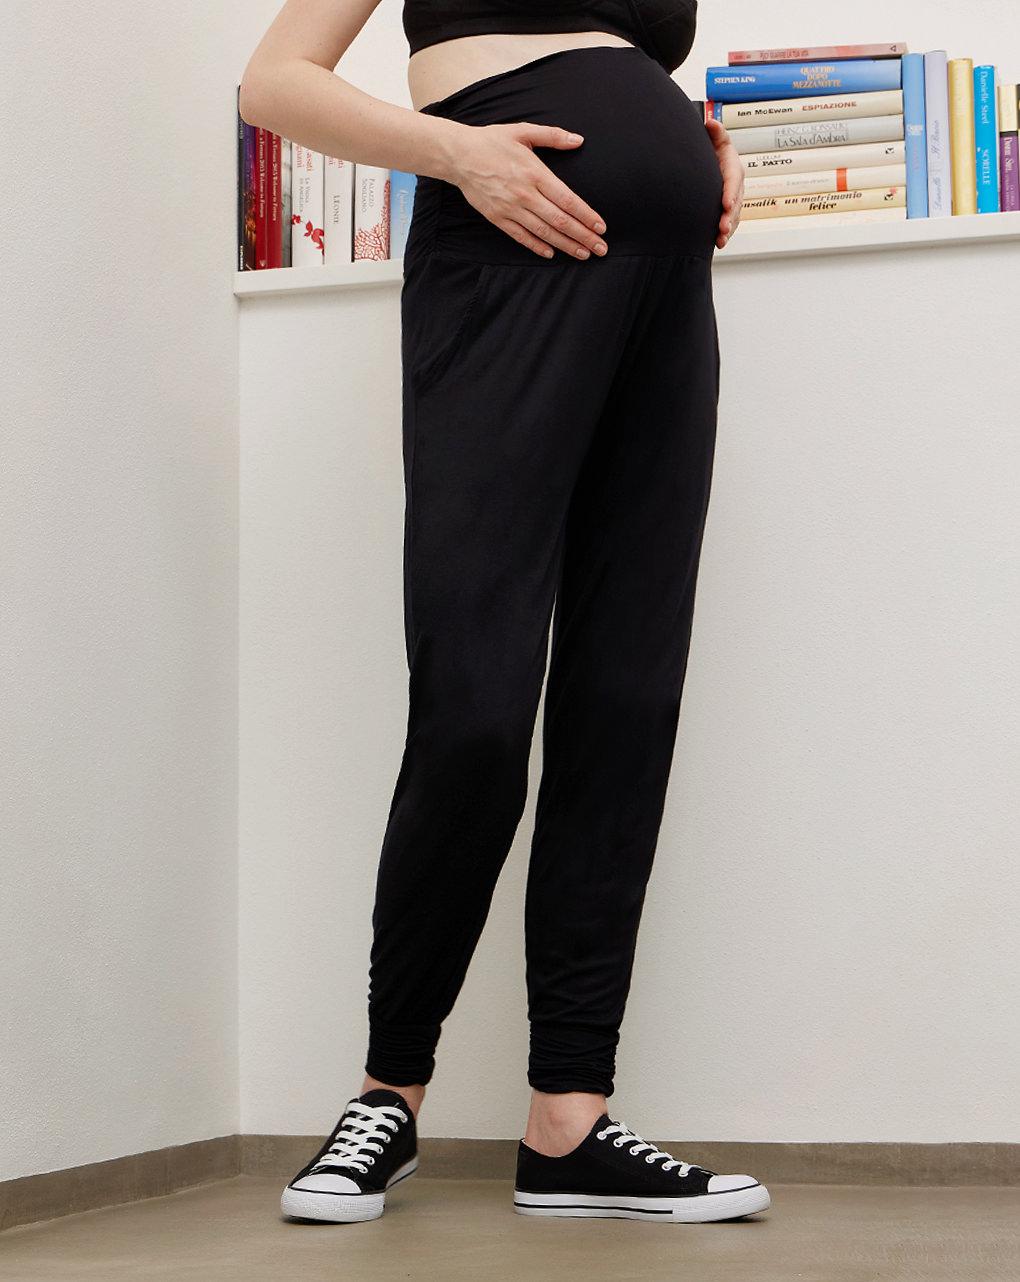 Pantalone premaman in viscosa stretch - Prénatal